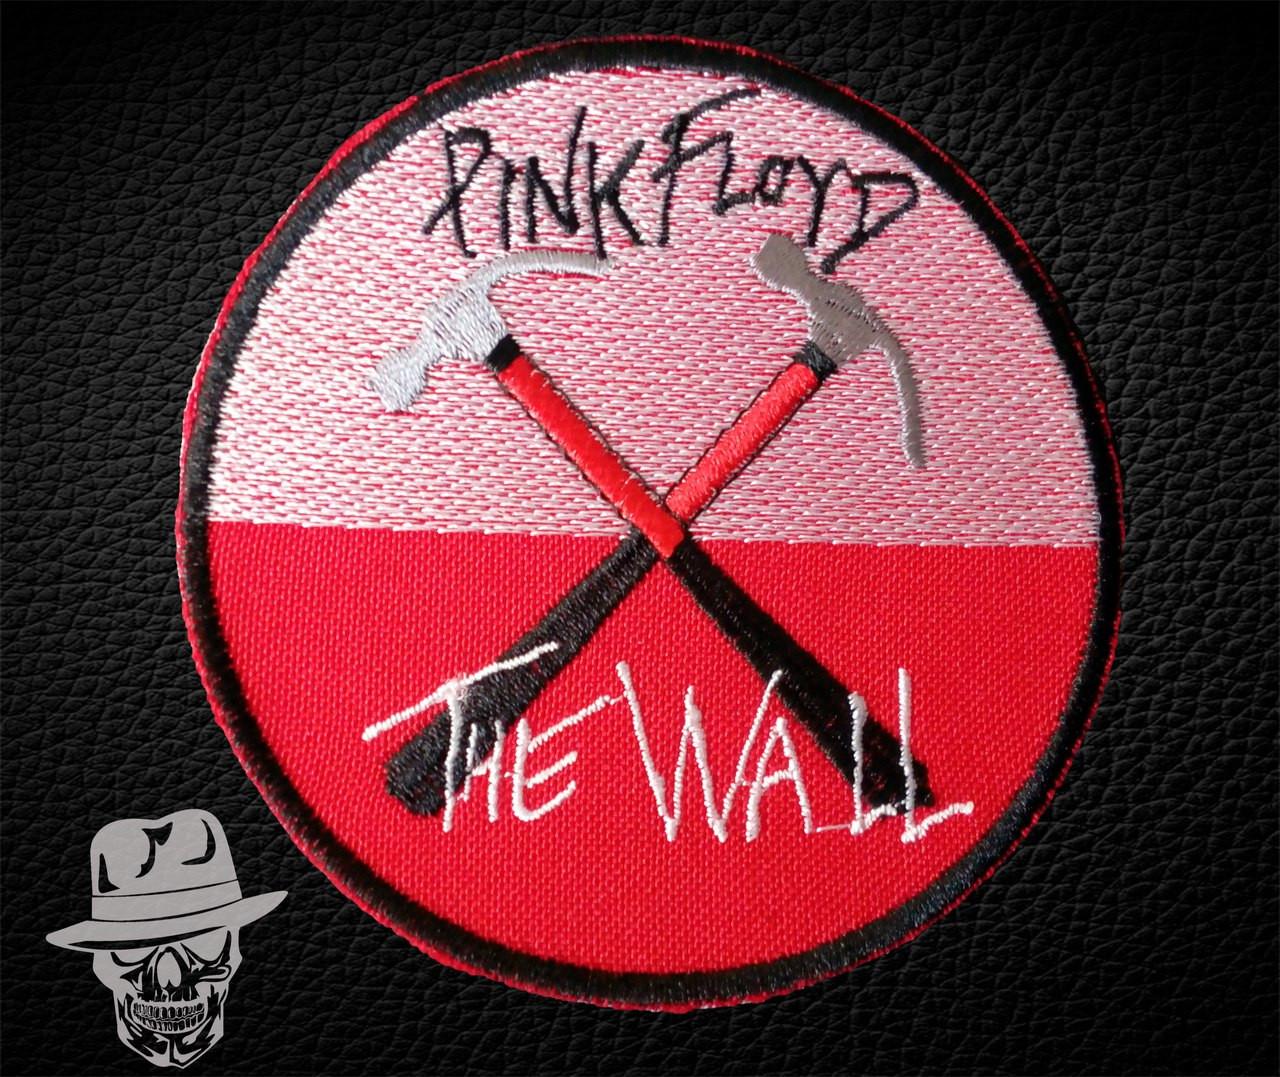 PINK FLOYD-3 (The Wall, коло) - нашивка з вишивкою